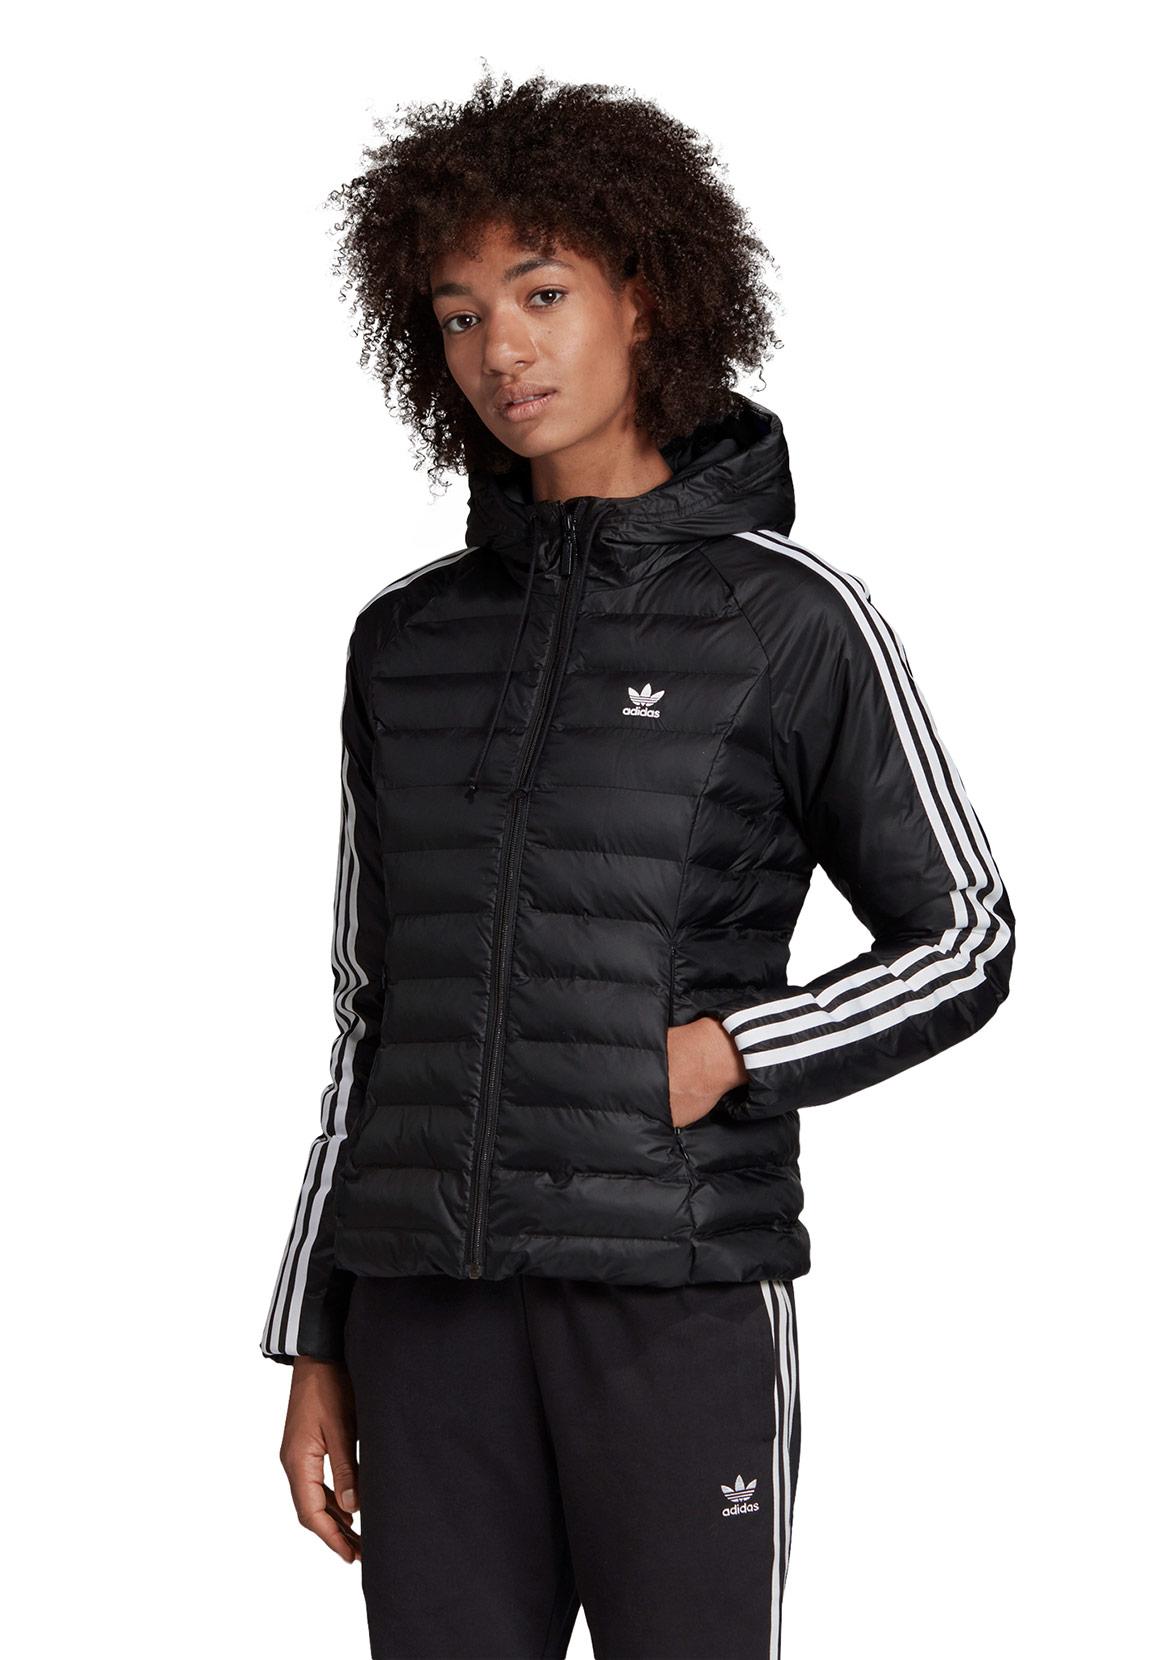 Black About Originals Details Jacket Ladies Slim Adidas Ed4784 CxtrshQBd